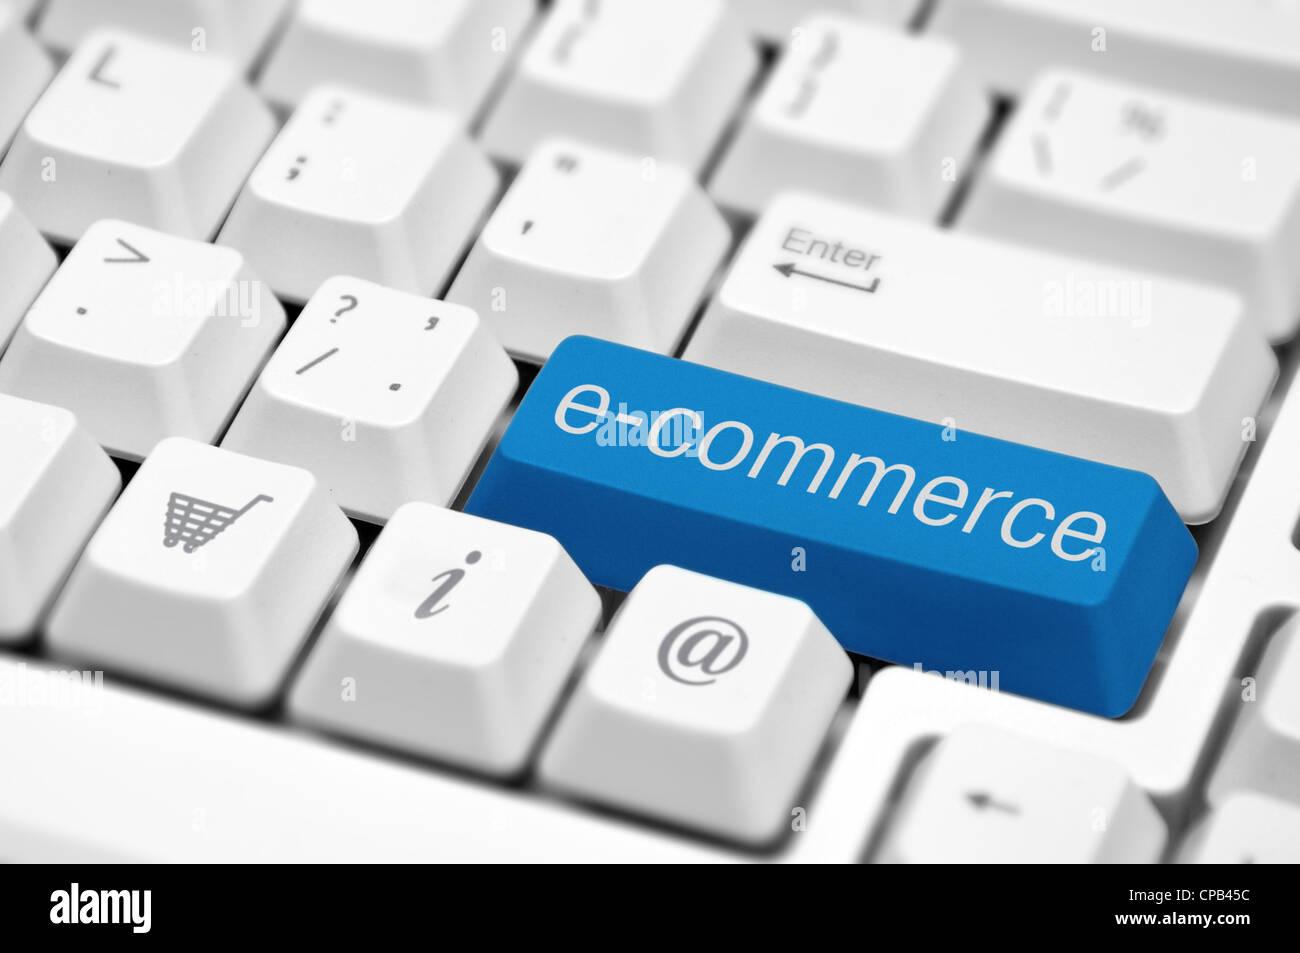 e-commerce key on a white keyboard closeup. E-commerce concept image. - Stock Image